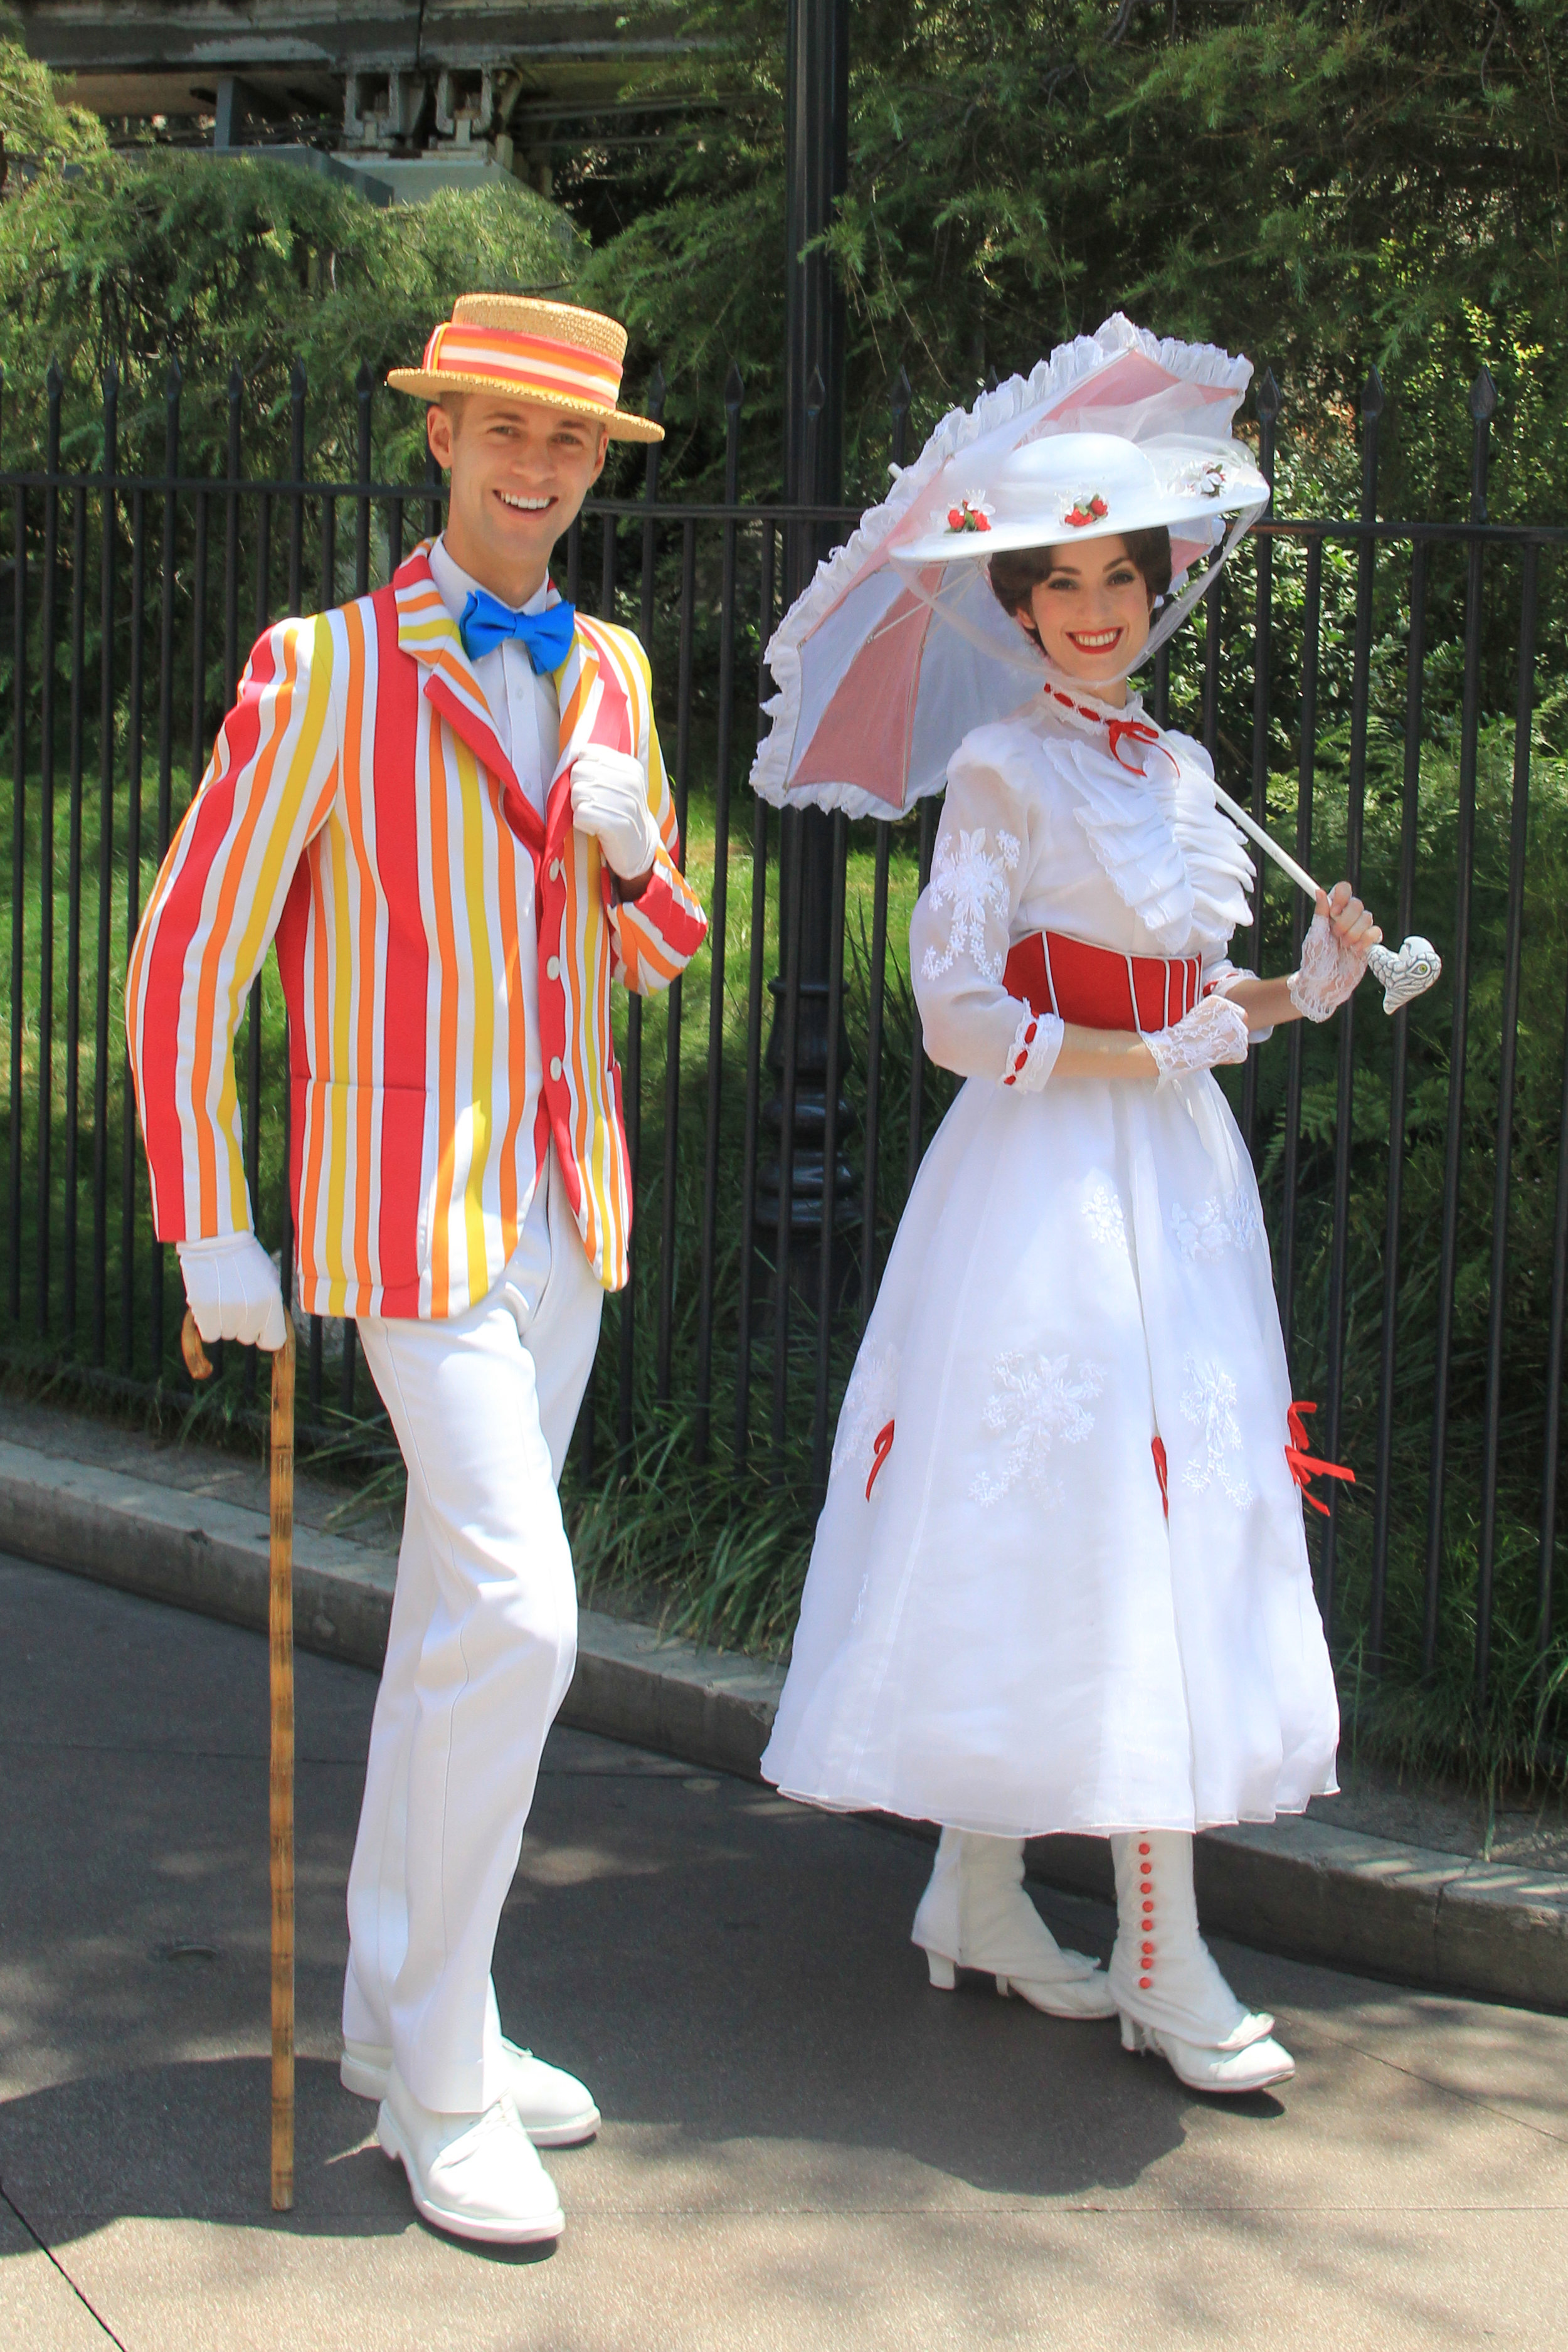 Bert and Mary Poppins at Disneyland